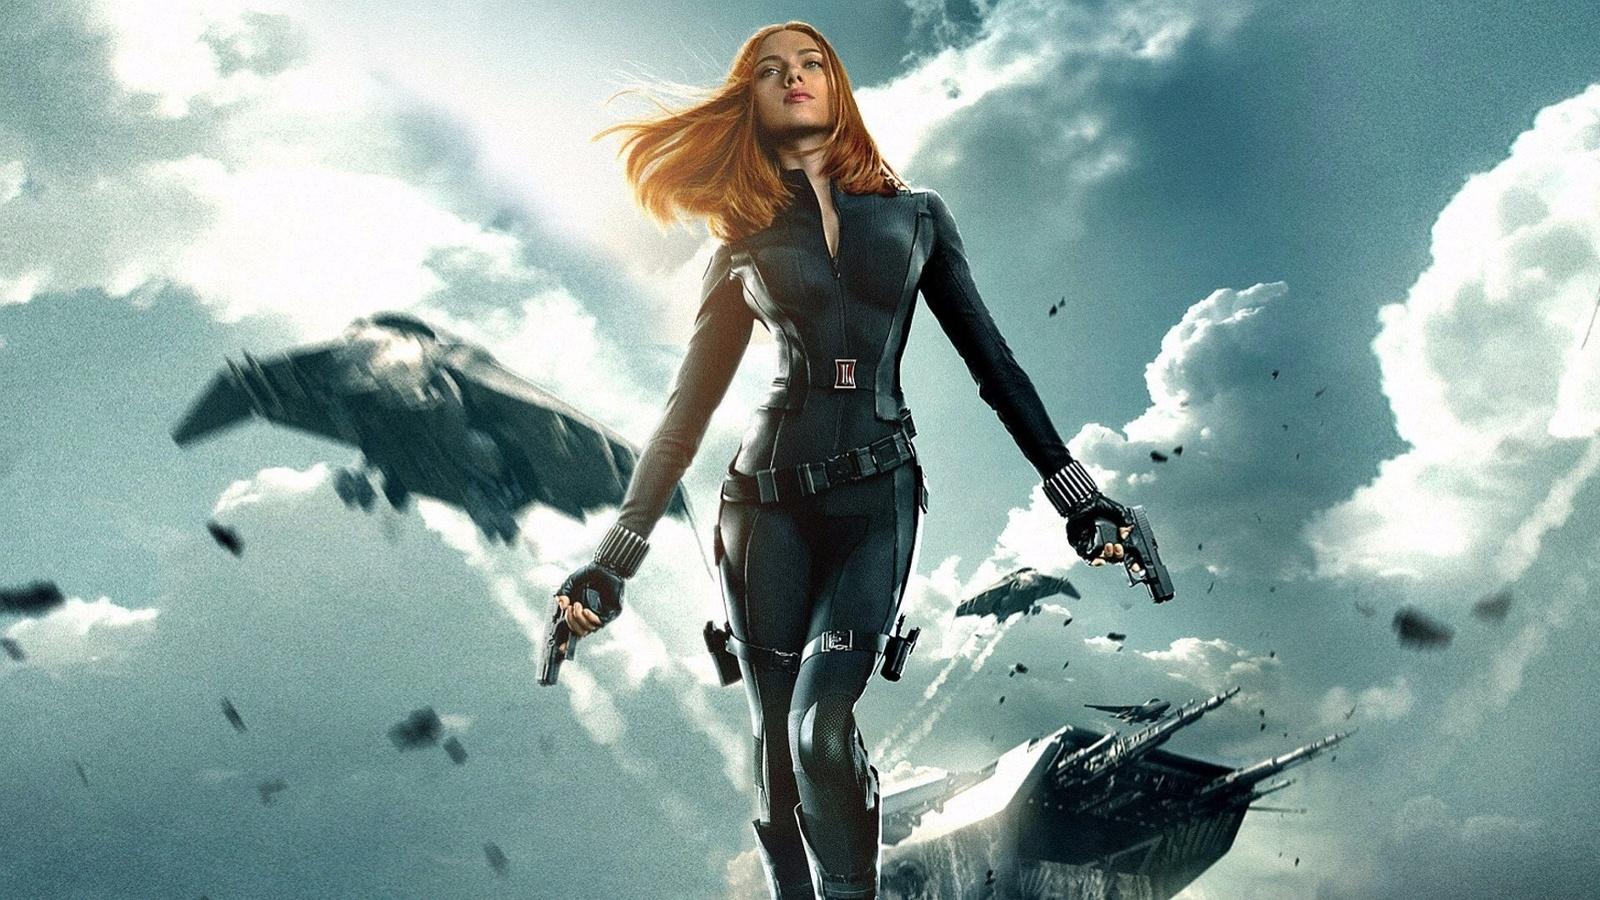 scarlett johansson, фильм, фон, фэнтези, redhead, marvel, black widow